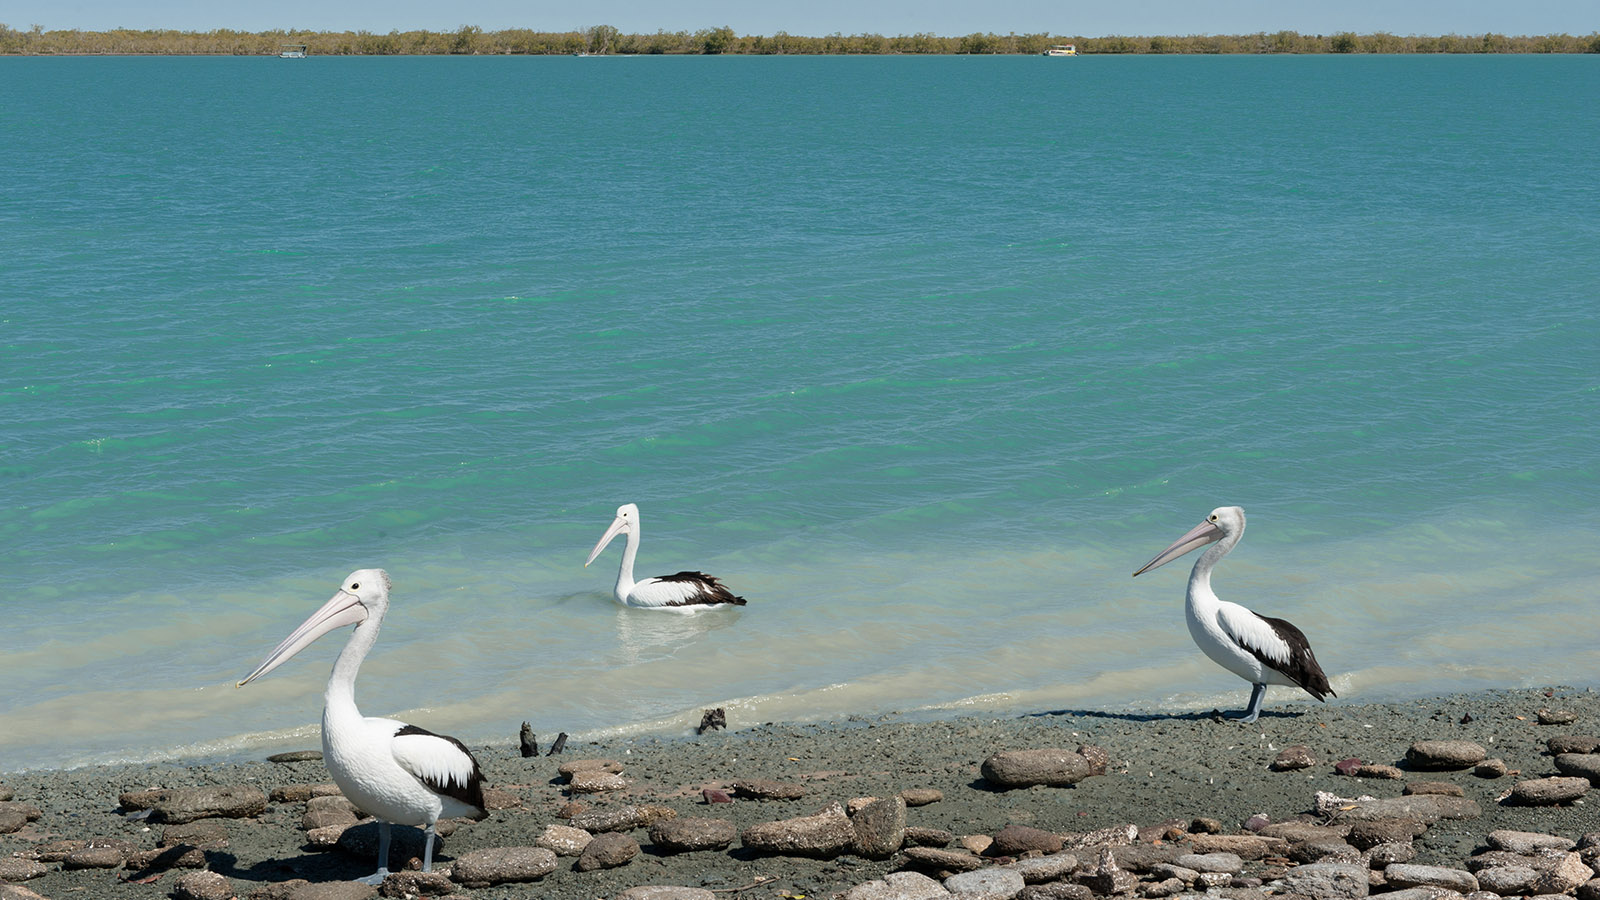 Konkurrenz für Angler in Karumba: die Pelikane vom Norman River. Foto: Hilke Maunder